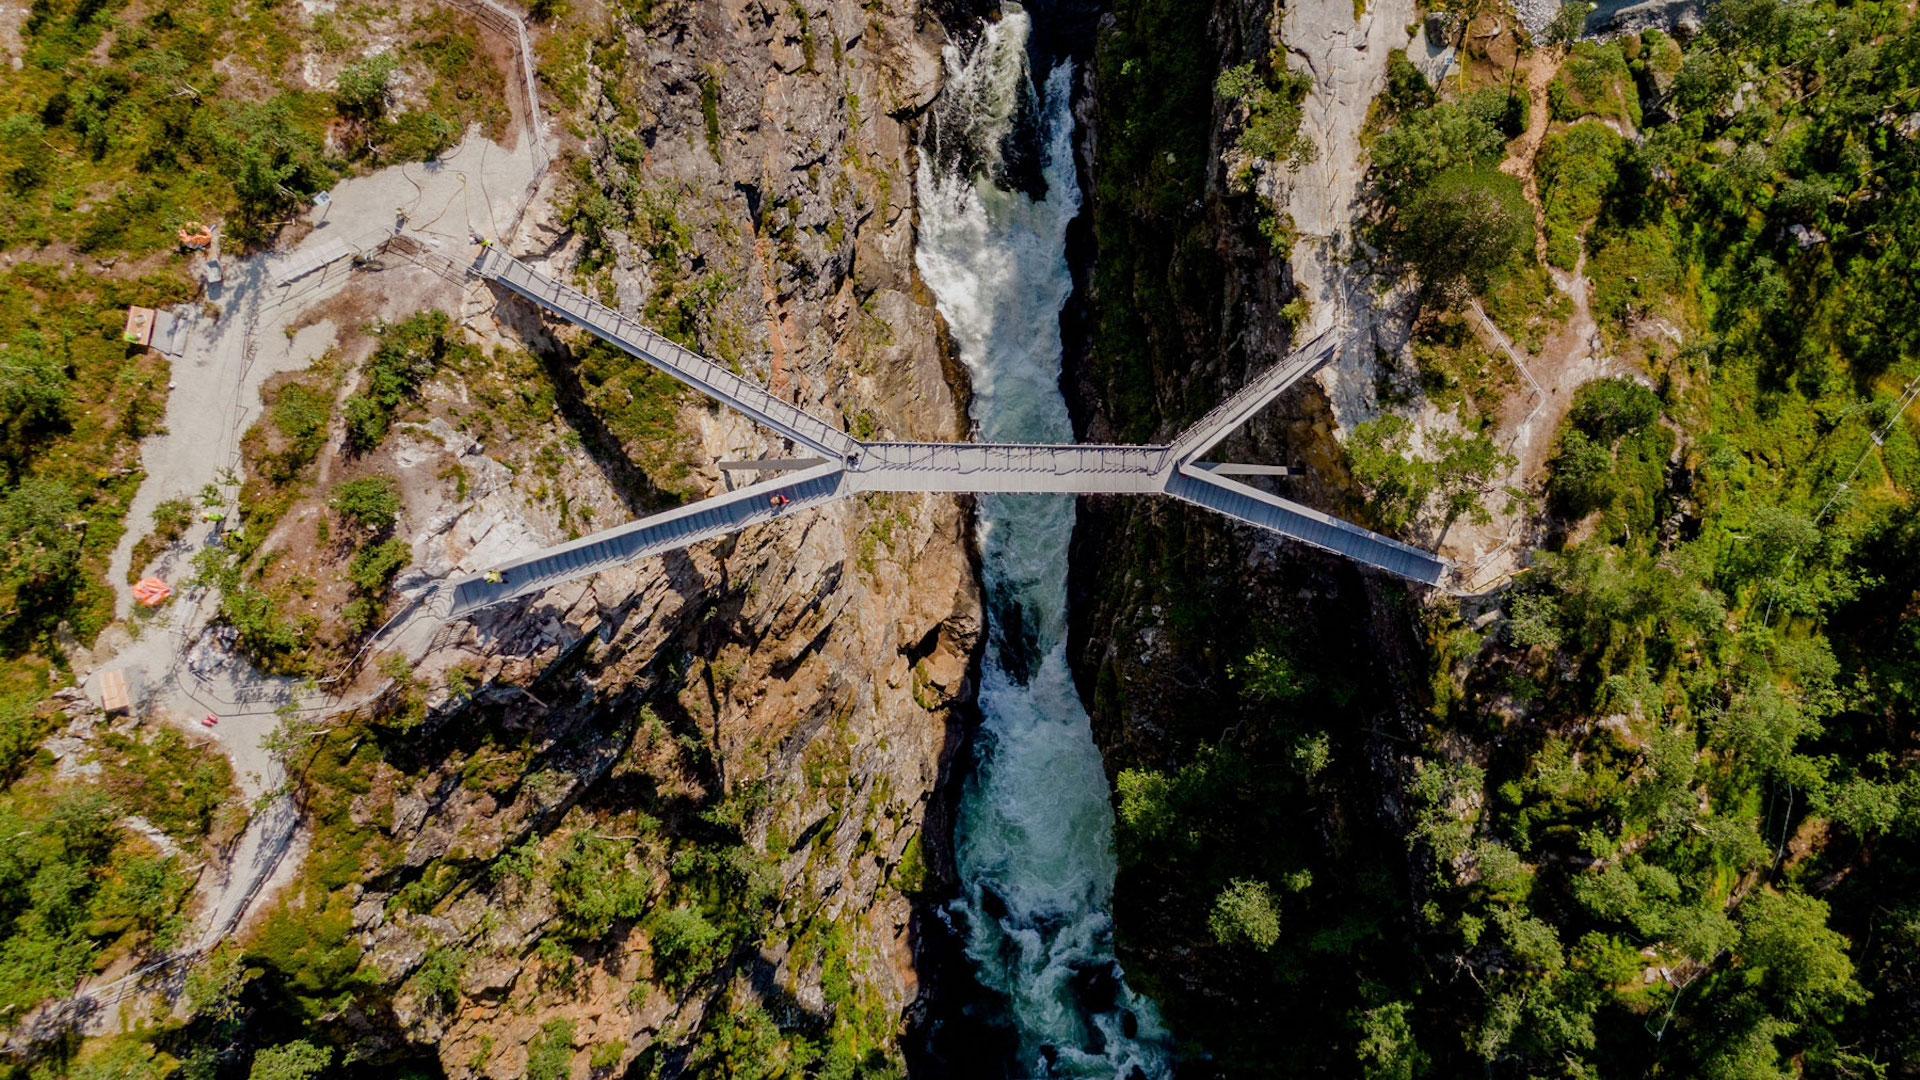 El espectacular puente que flota sobre cascadas en Noruega